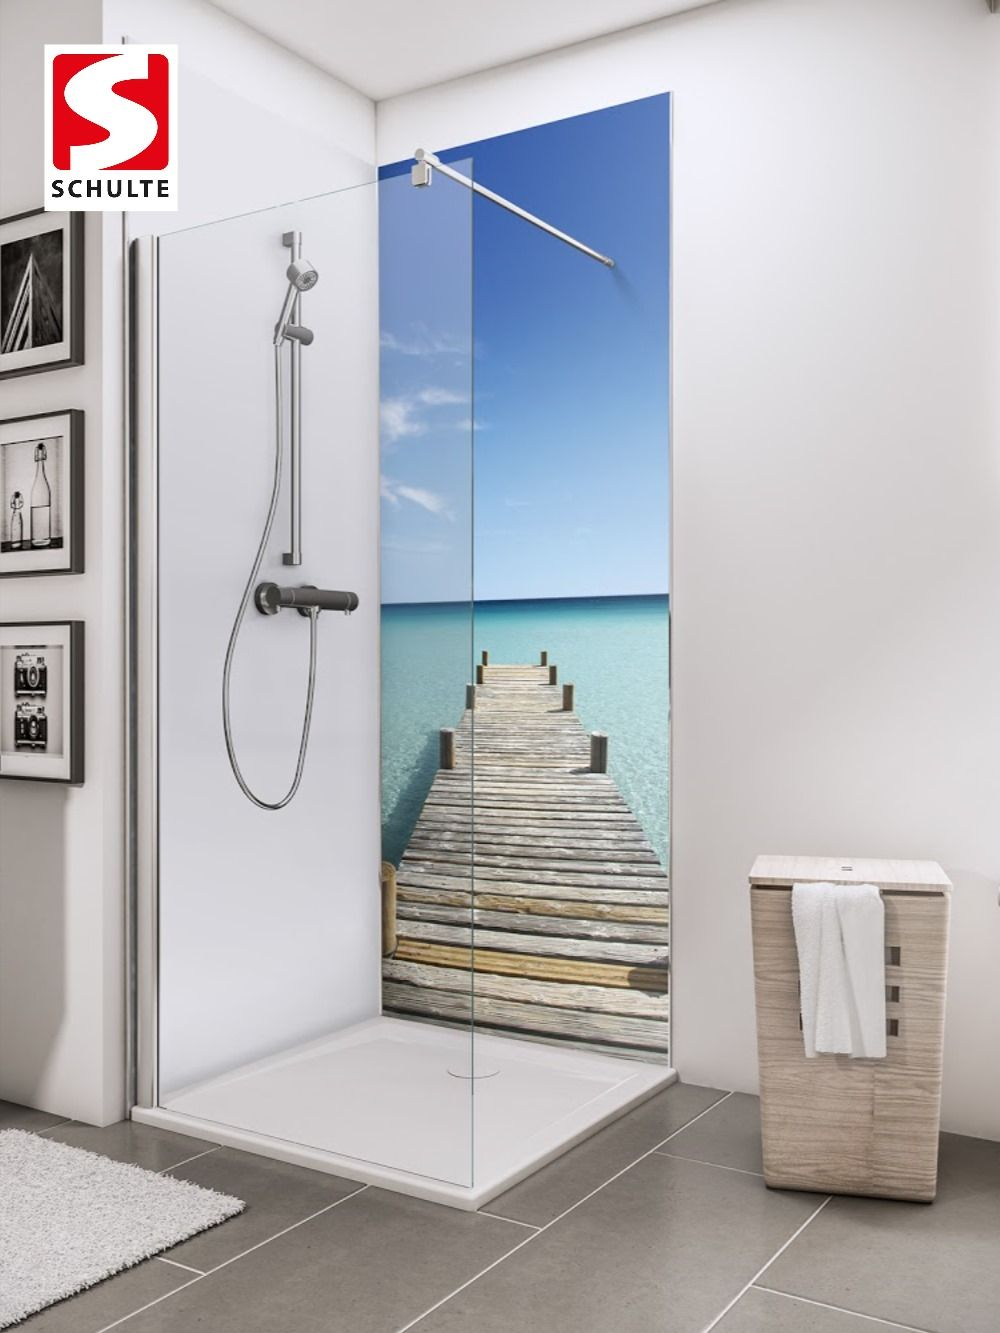 Schulte Duschruckwande Decodesign Foto Steg Malediven Paneel Wandverkleidung Bad Idee In 2020 Wandverkleidung Bad Duschruckwand Dusche